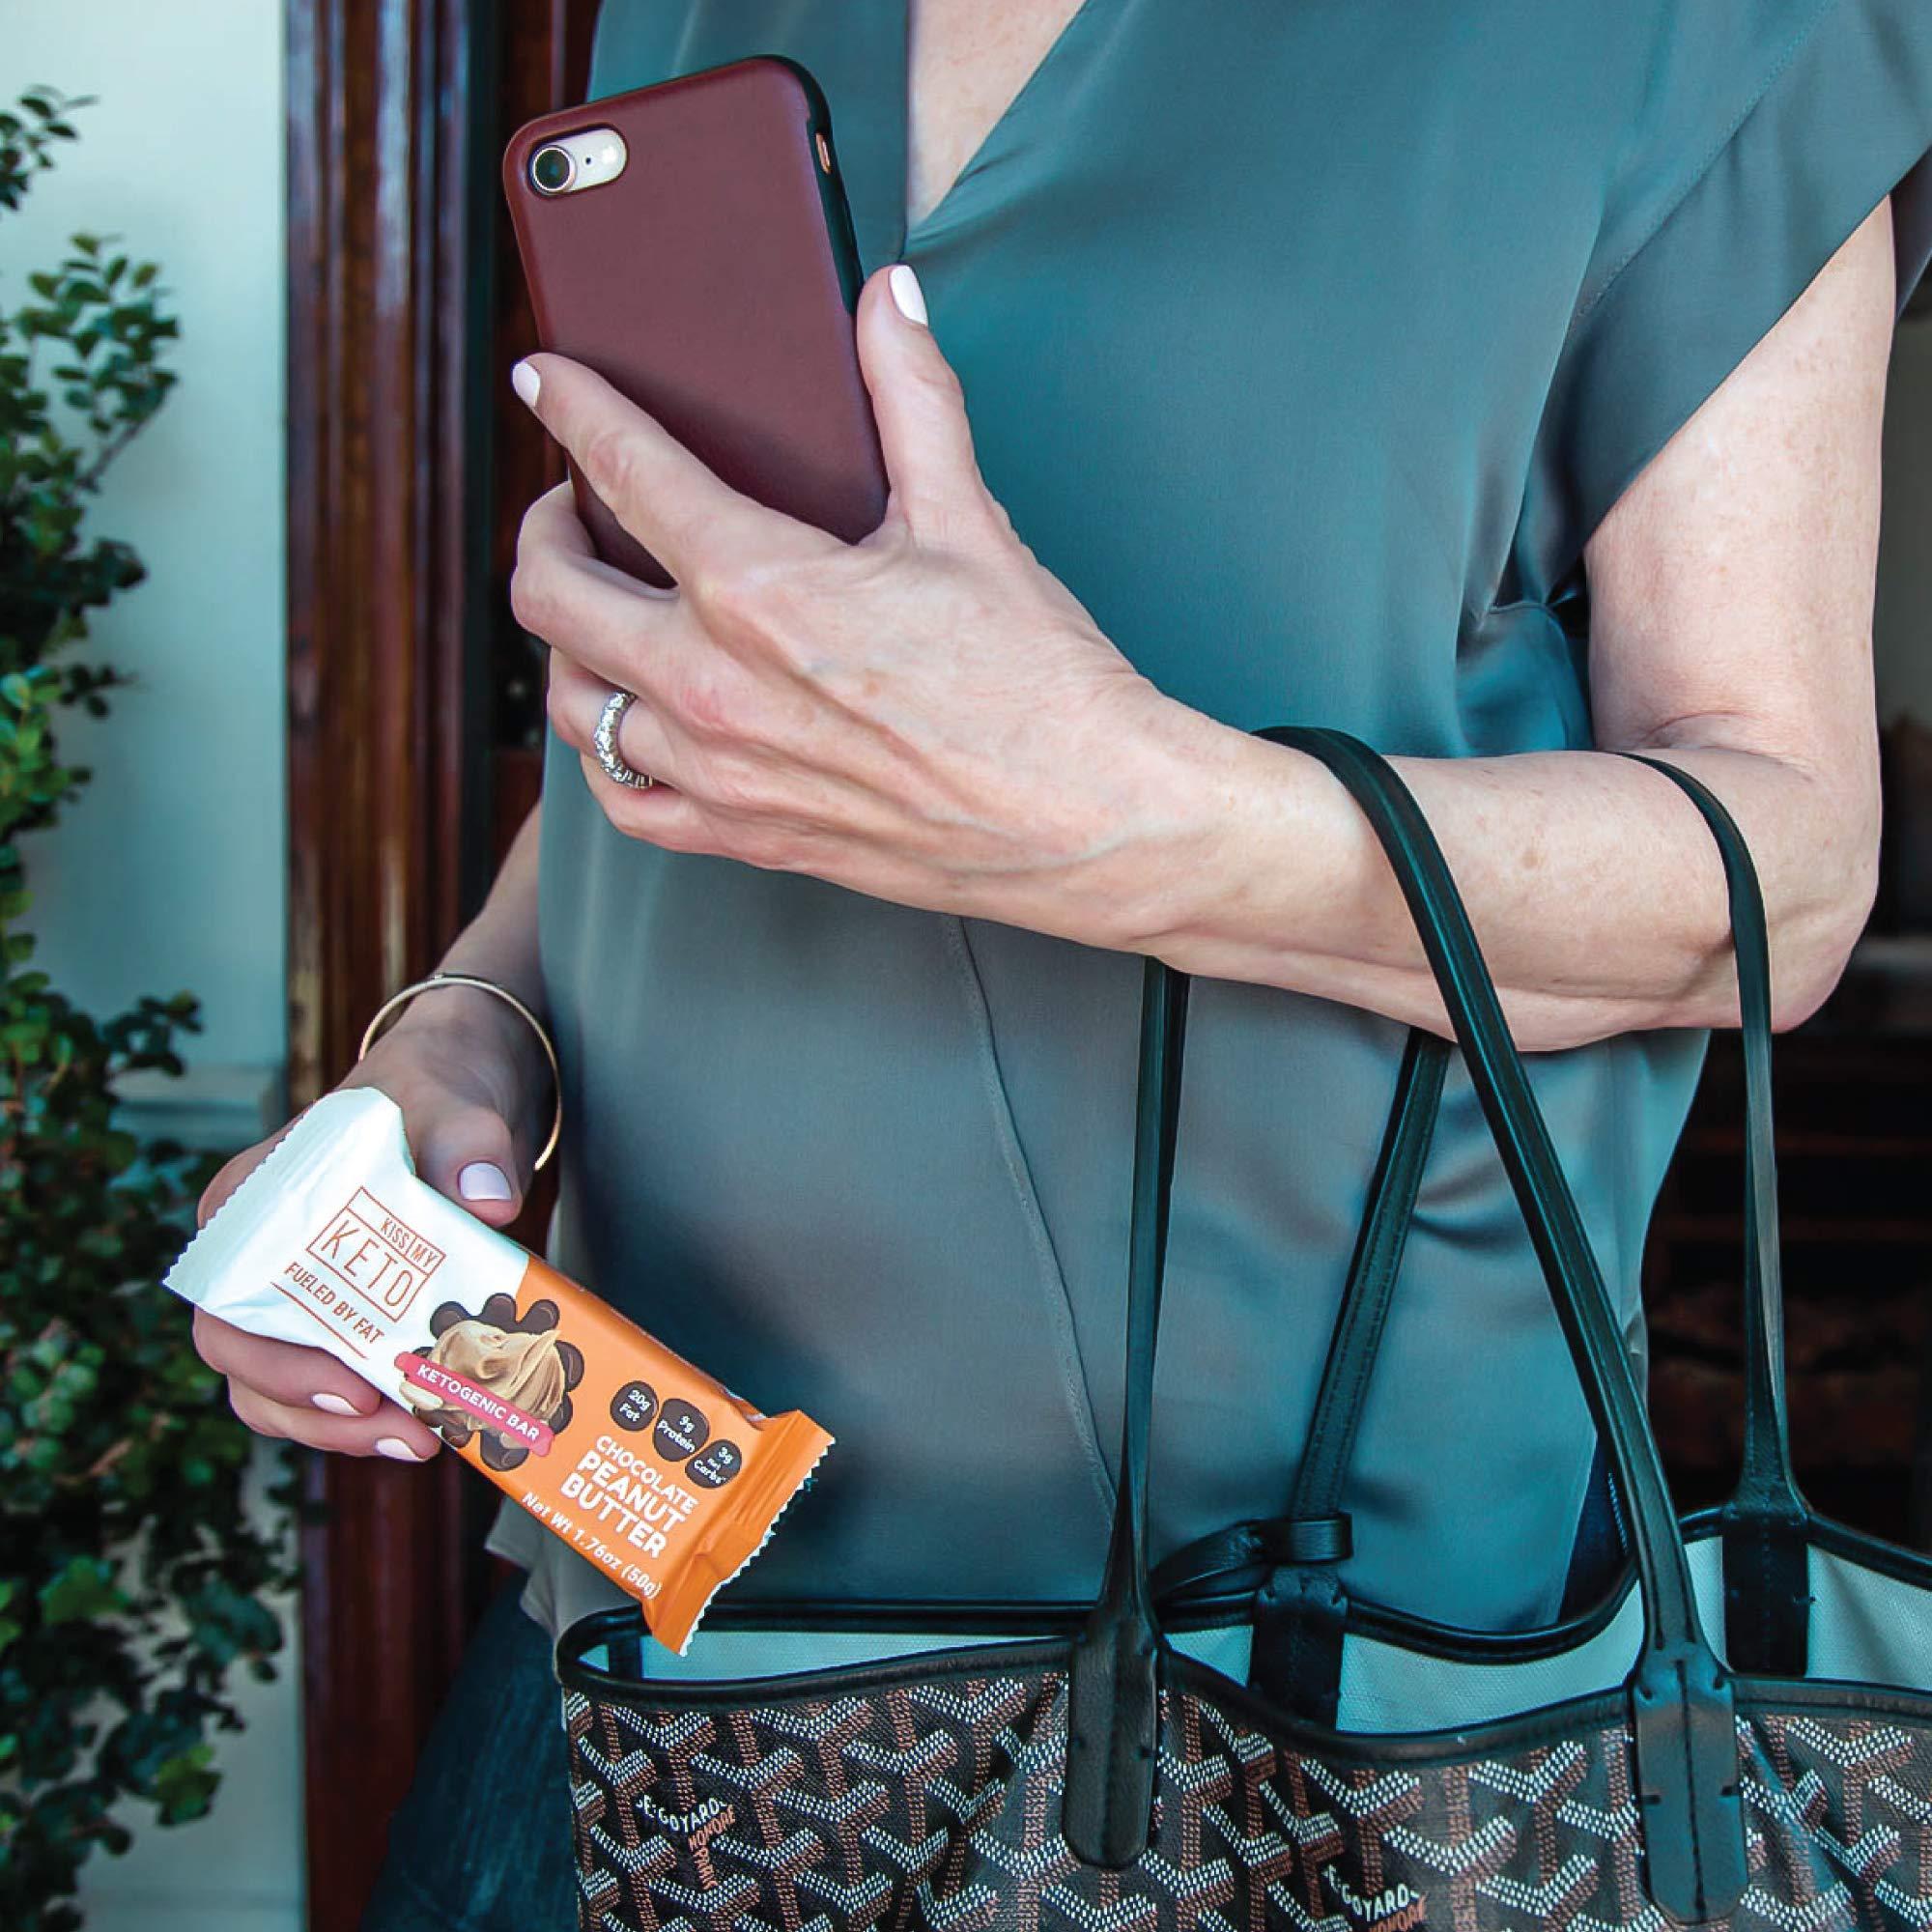 Kiss My Keto Snacks Keto Bars - Keto Chocolate Peanut Butter (3 Pack, 36 Bars), Nutritional Keto Food Bars, Paleo, Low Carb/Glycemic Keto Friendly Foods, All Natural On-The-Go Snacks, 3g Net by Kiss My Keto (Image #7)